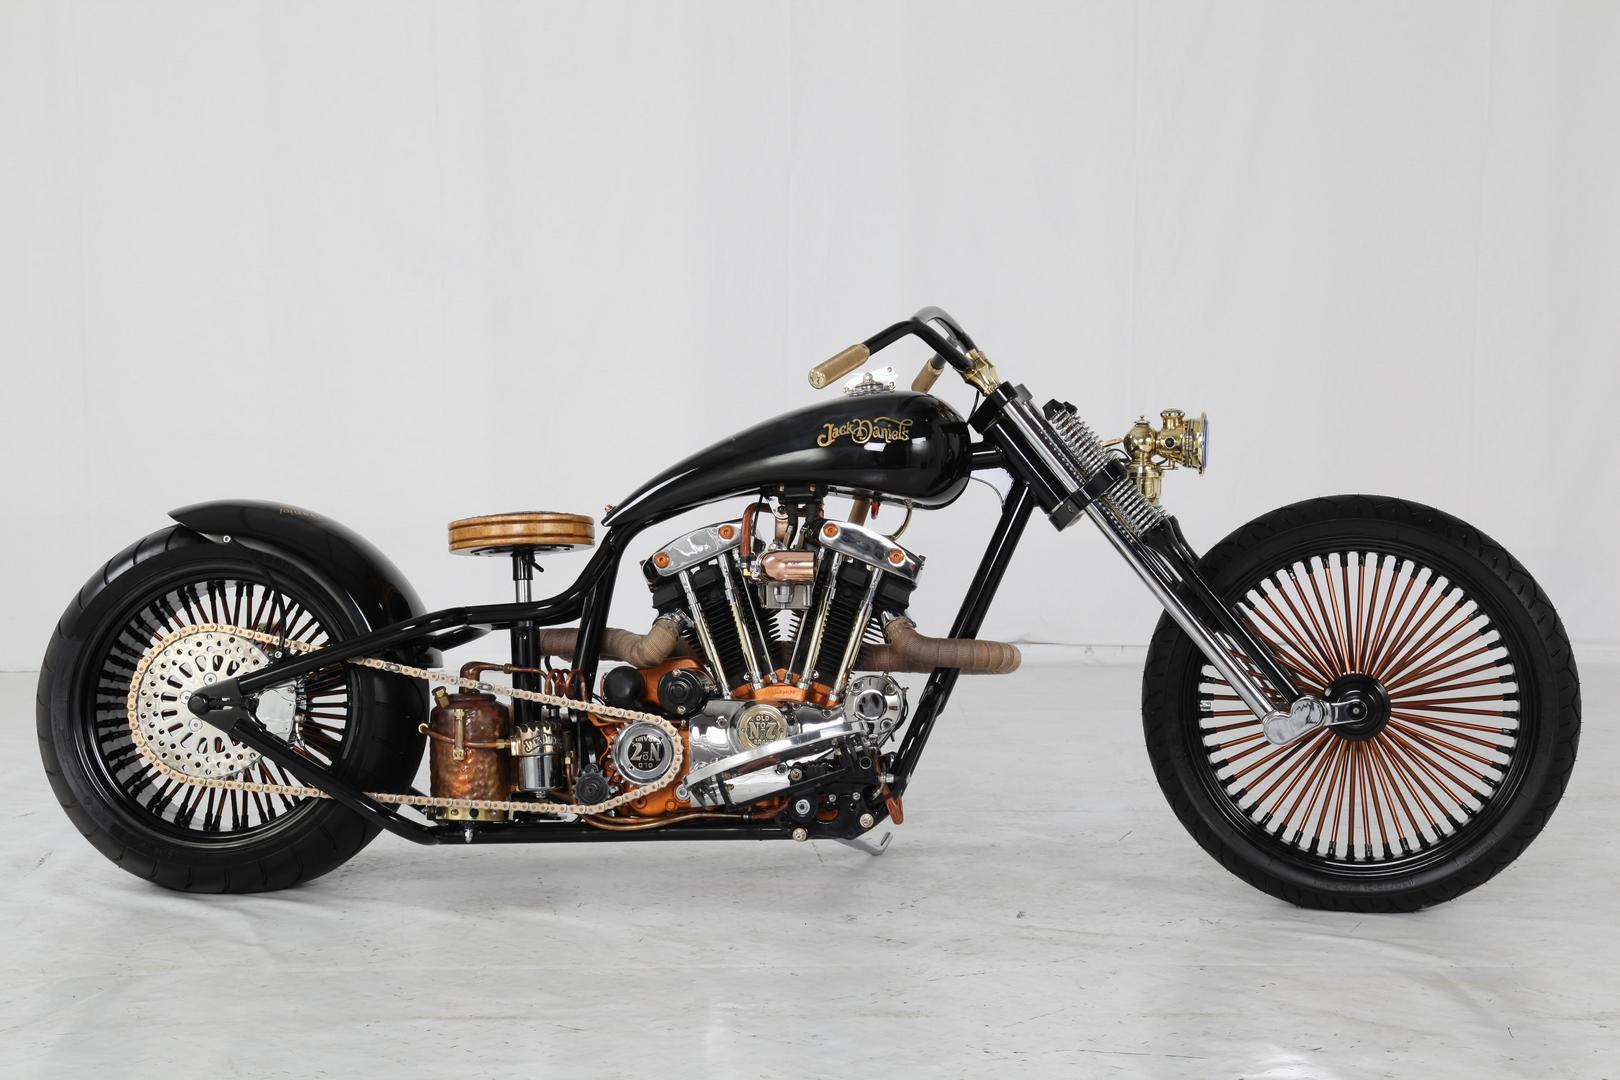 American Iron Custom Harley Davidson Motorcycles Wiring Diagram Evo Bobber Choppe